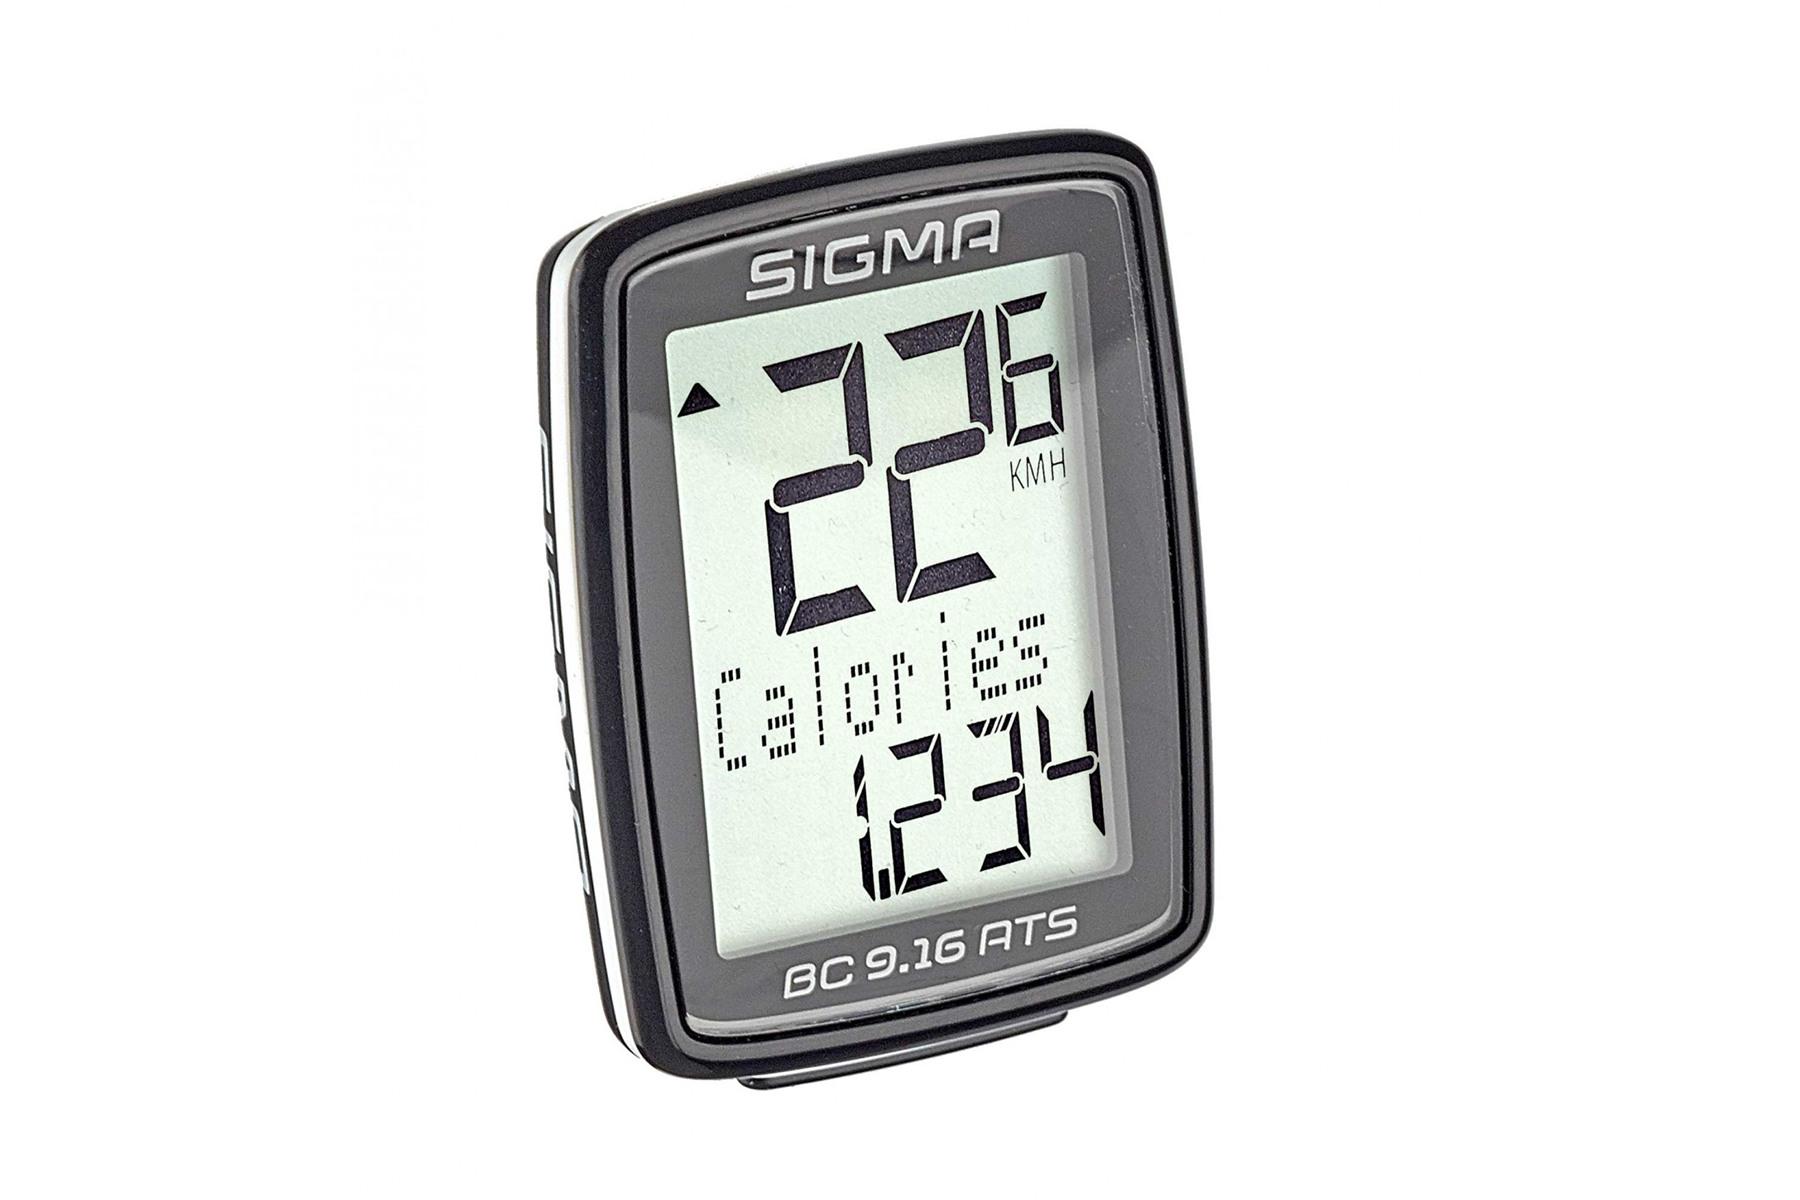 Sigma BC 9.16 ATS Fahrradcomputer -kabellos-